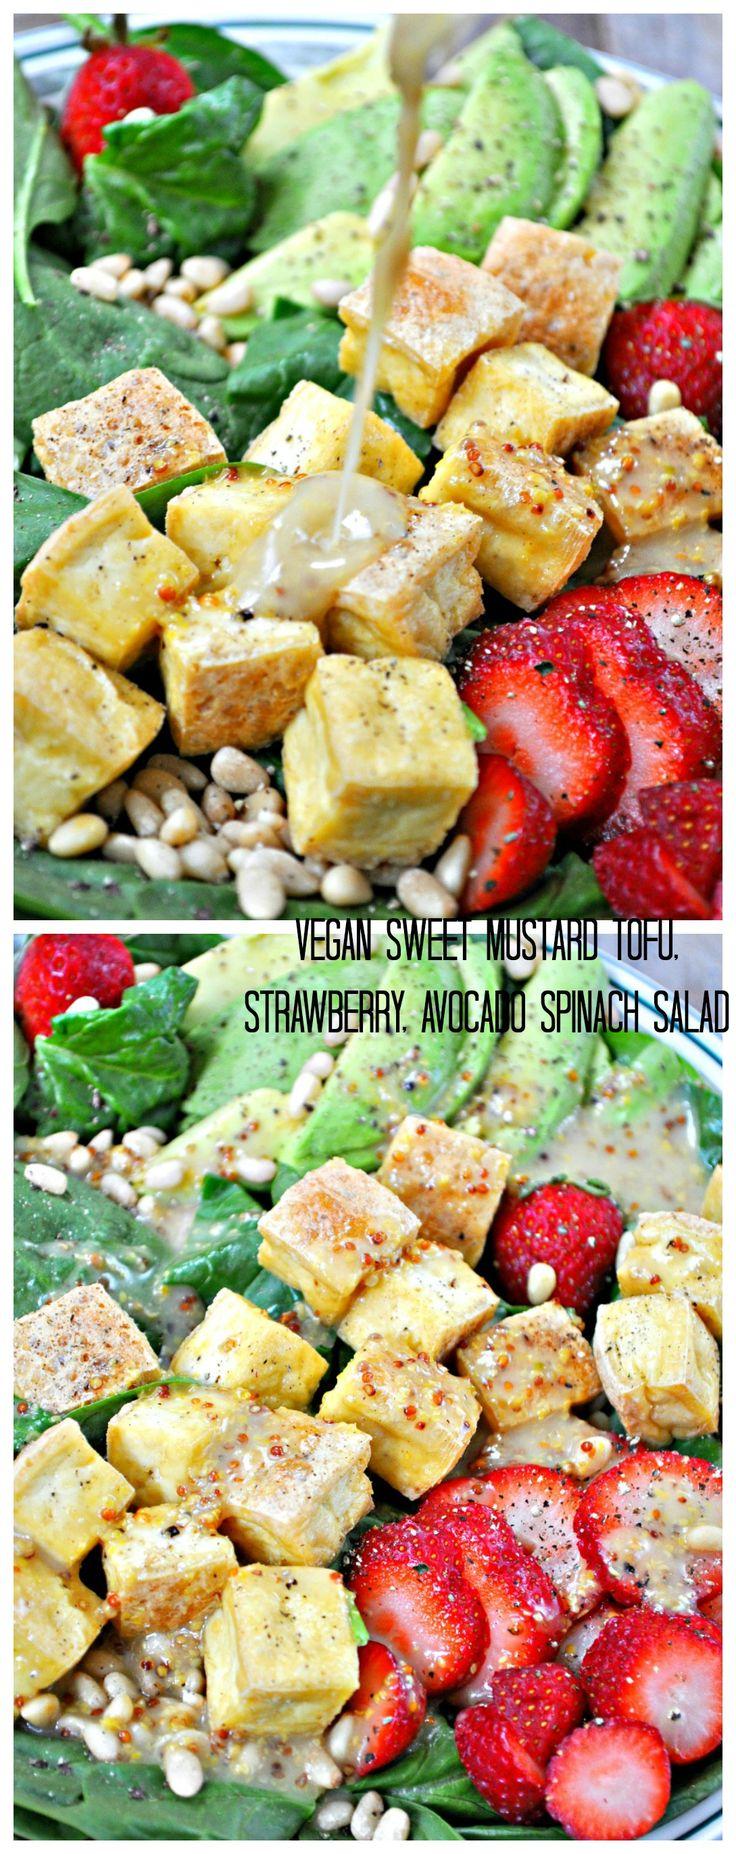 Vegan Sweet Mustard Tofu, Strawberry, Avocado Salad